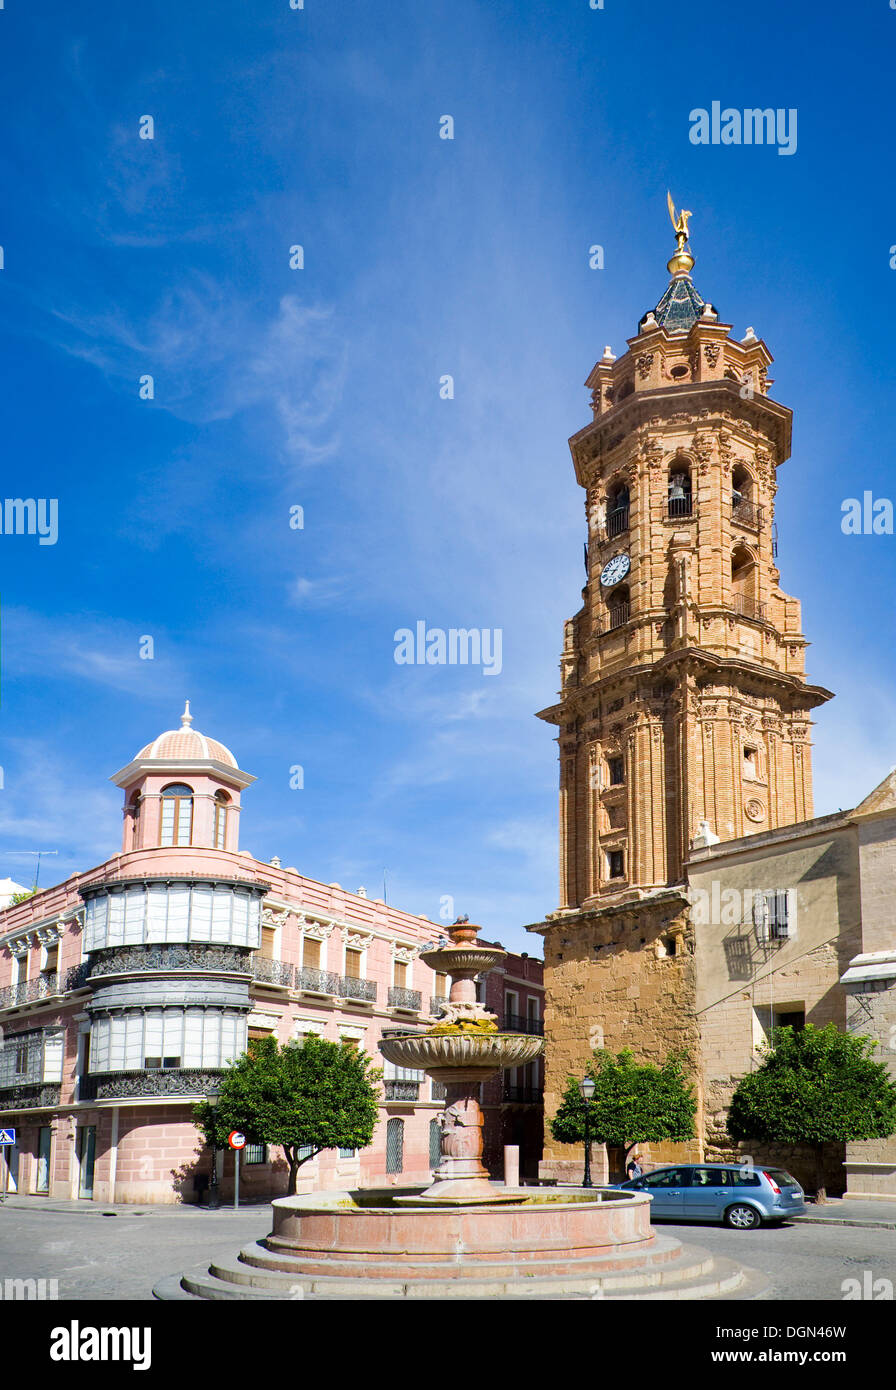 Historic buildings church and plaza San Sebastian, centre of Antequera, Spain - Stock Image